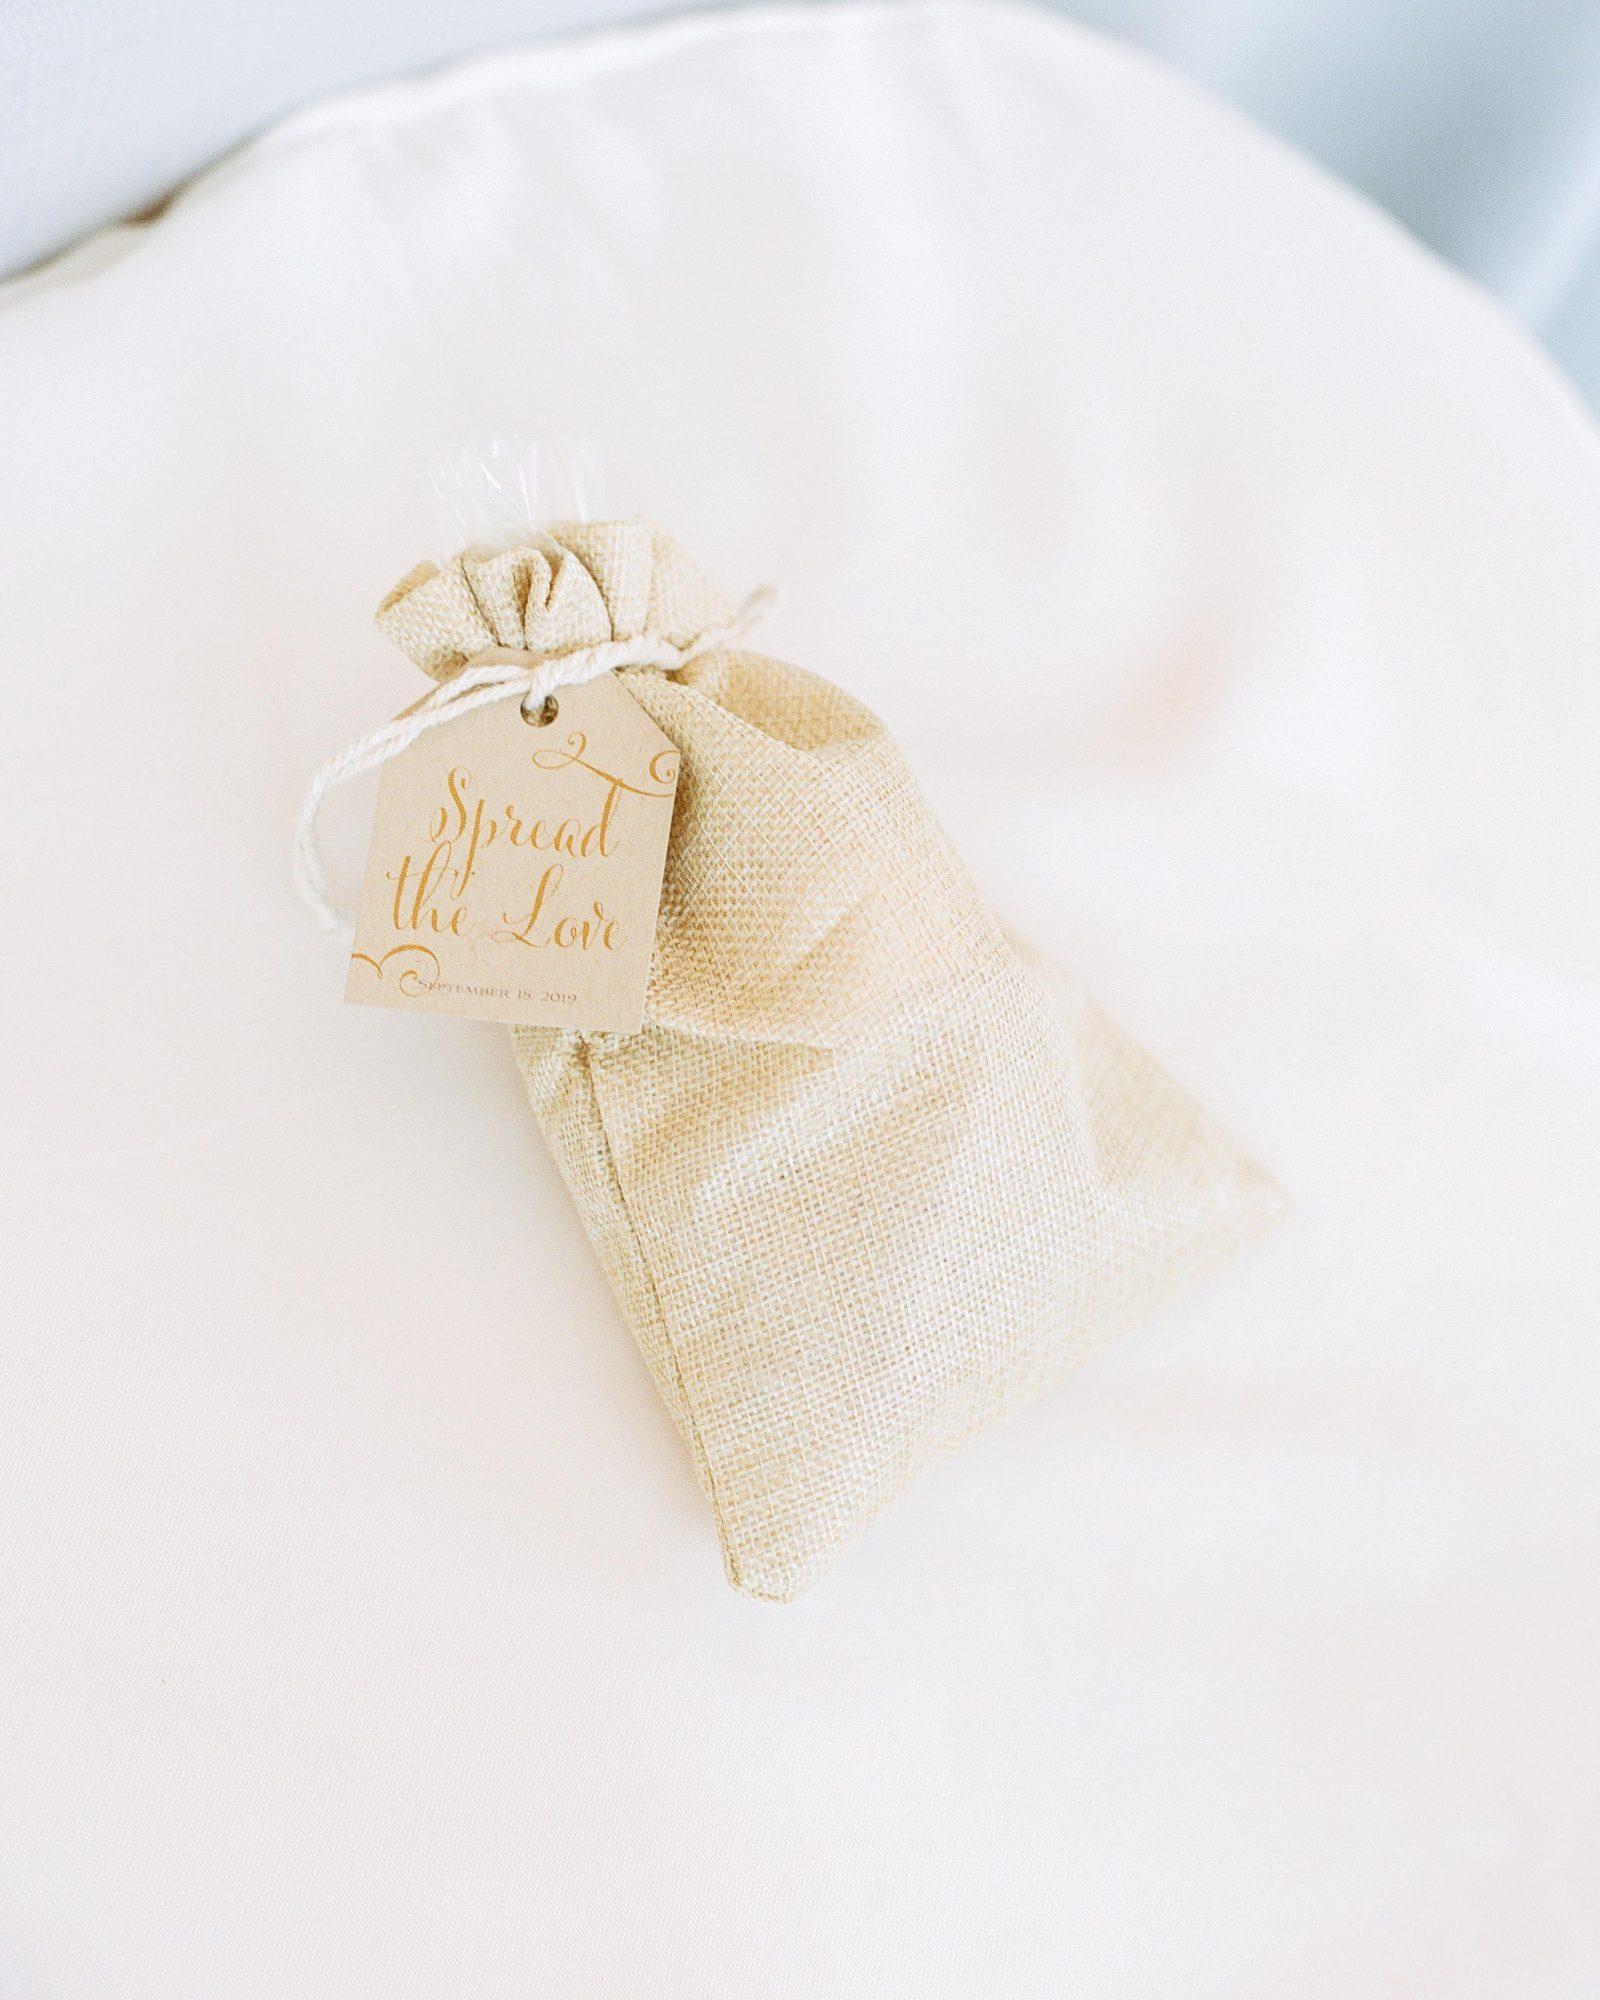 jill phil wedding favors in small burlap bag